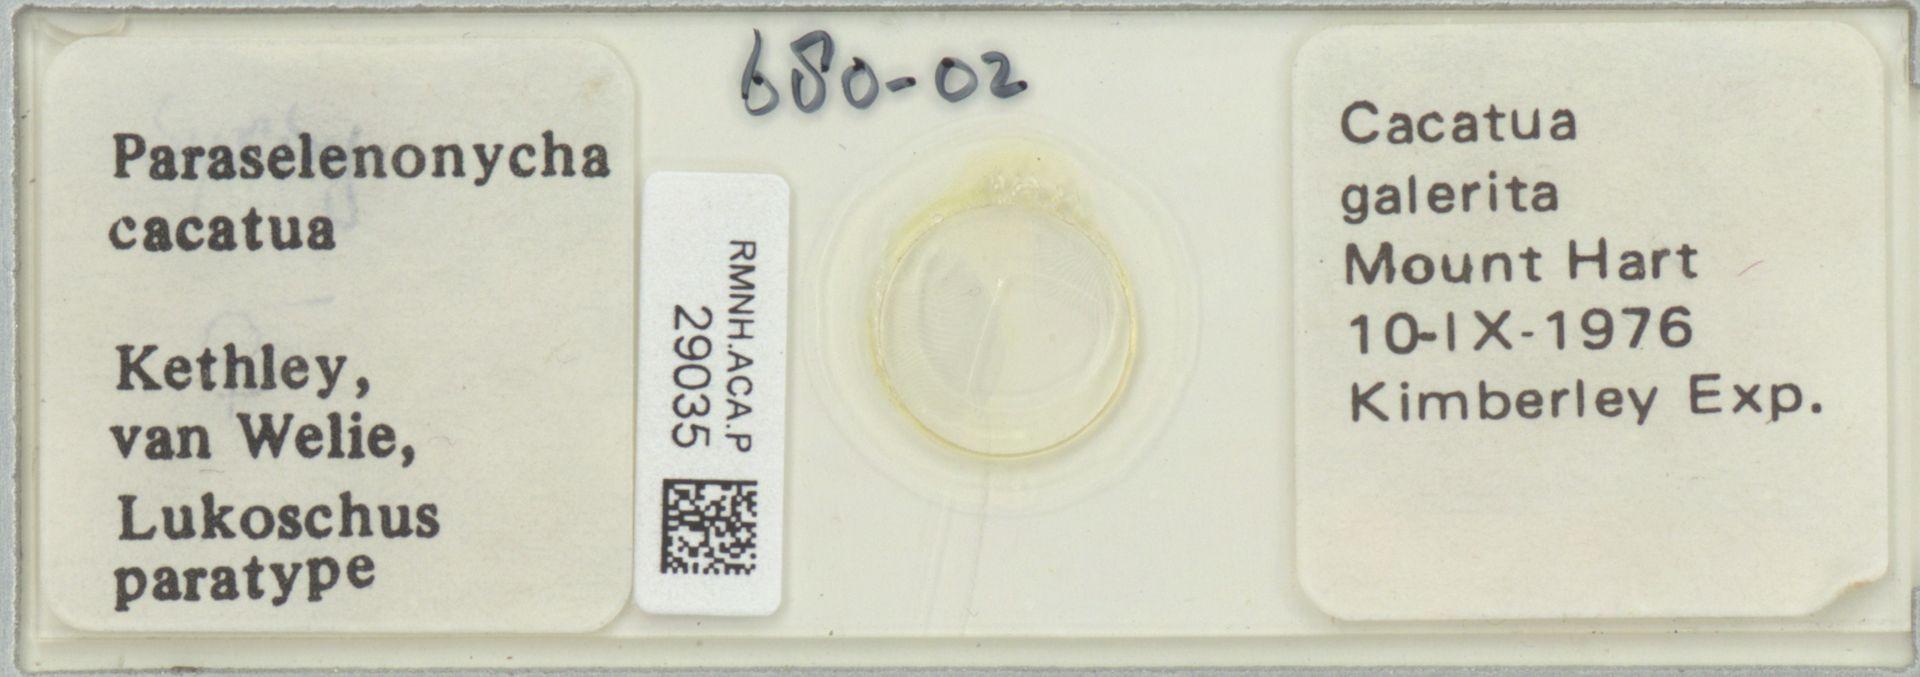 RMNH.ACA.P.29035 | Paraselenonycha cacatua Kethley, van Welie, Lukoschus